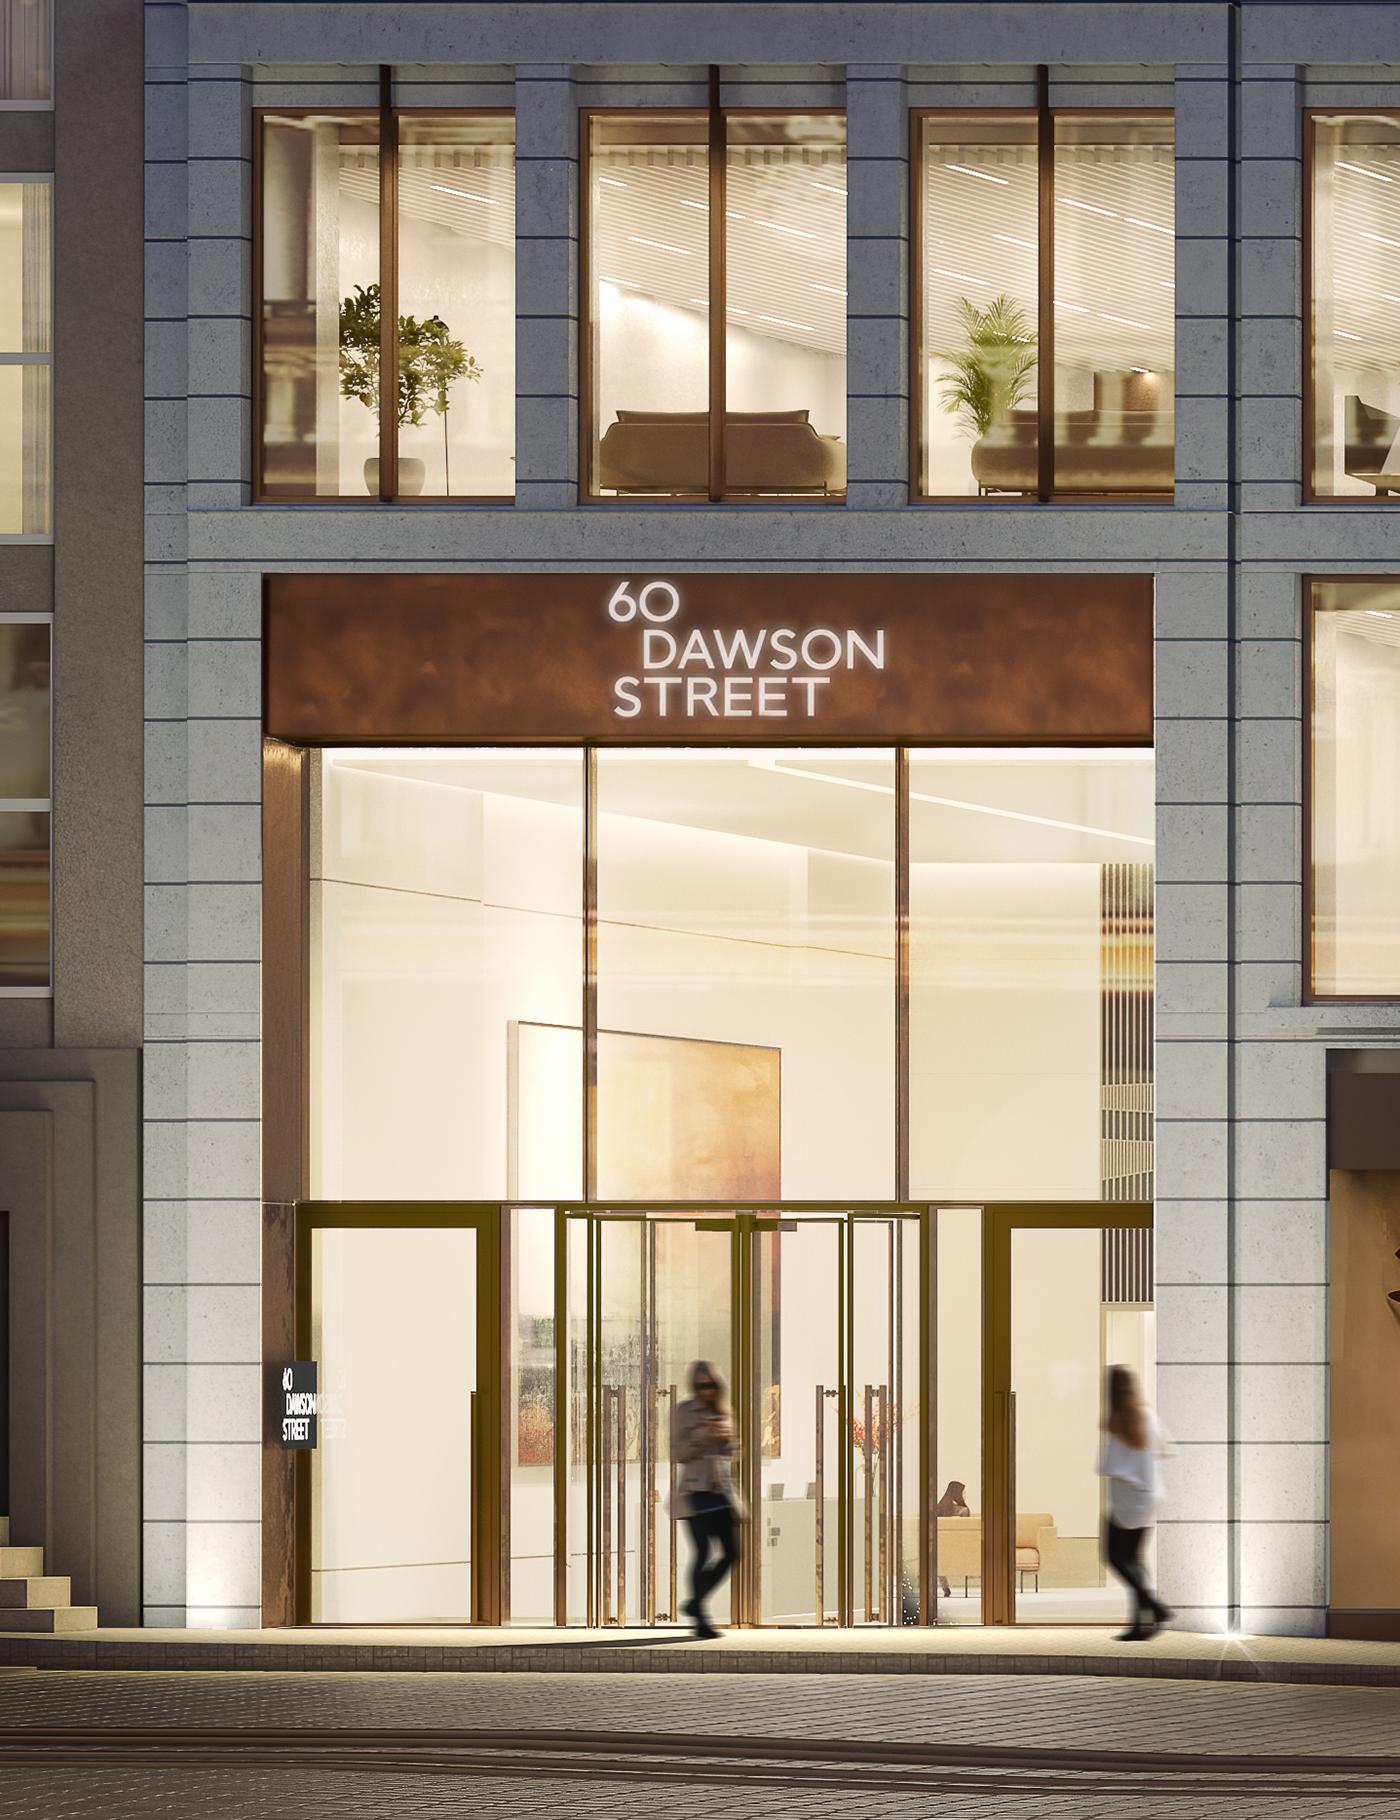 Grafton Place and 60 Dawson Street